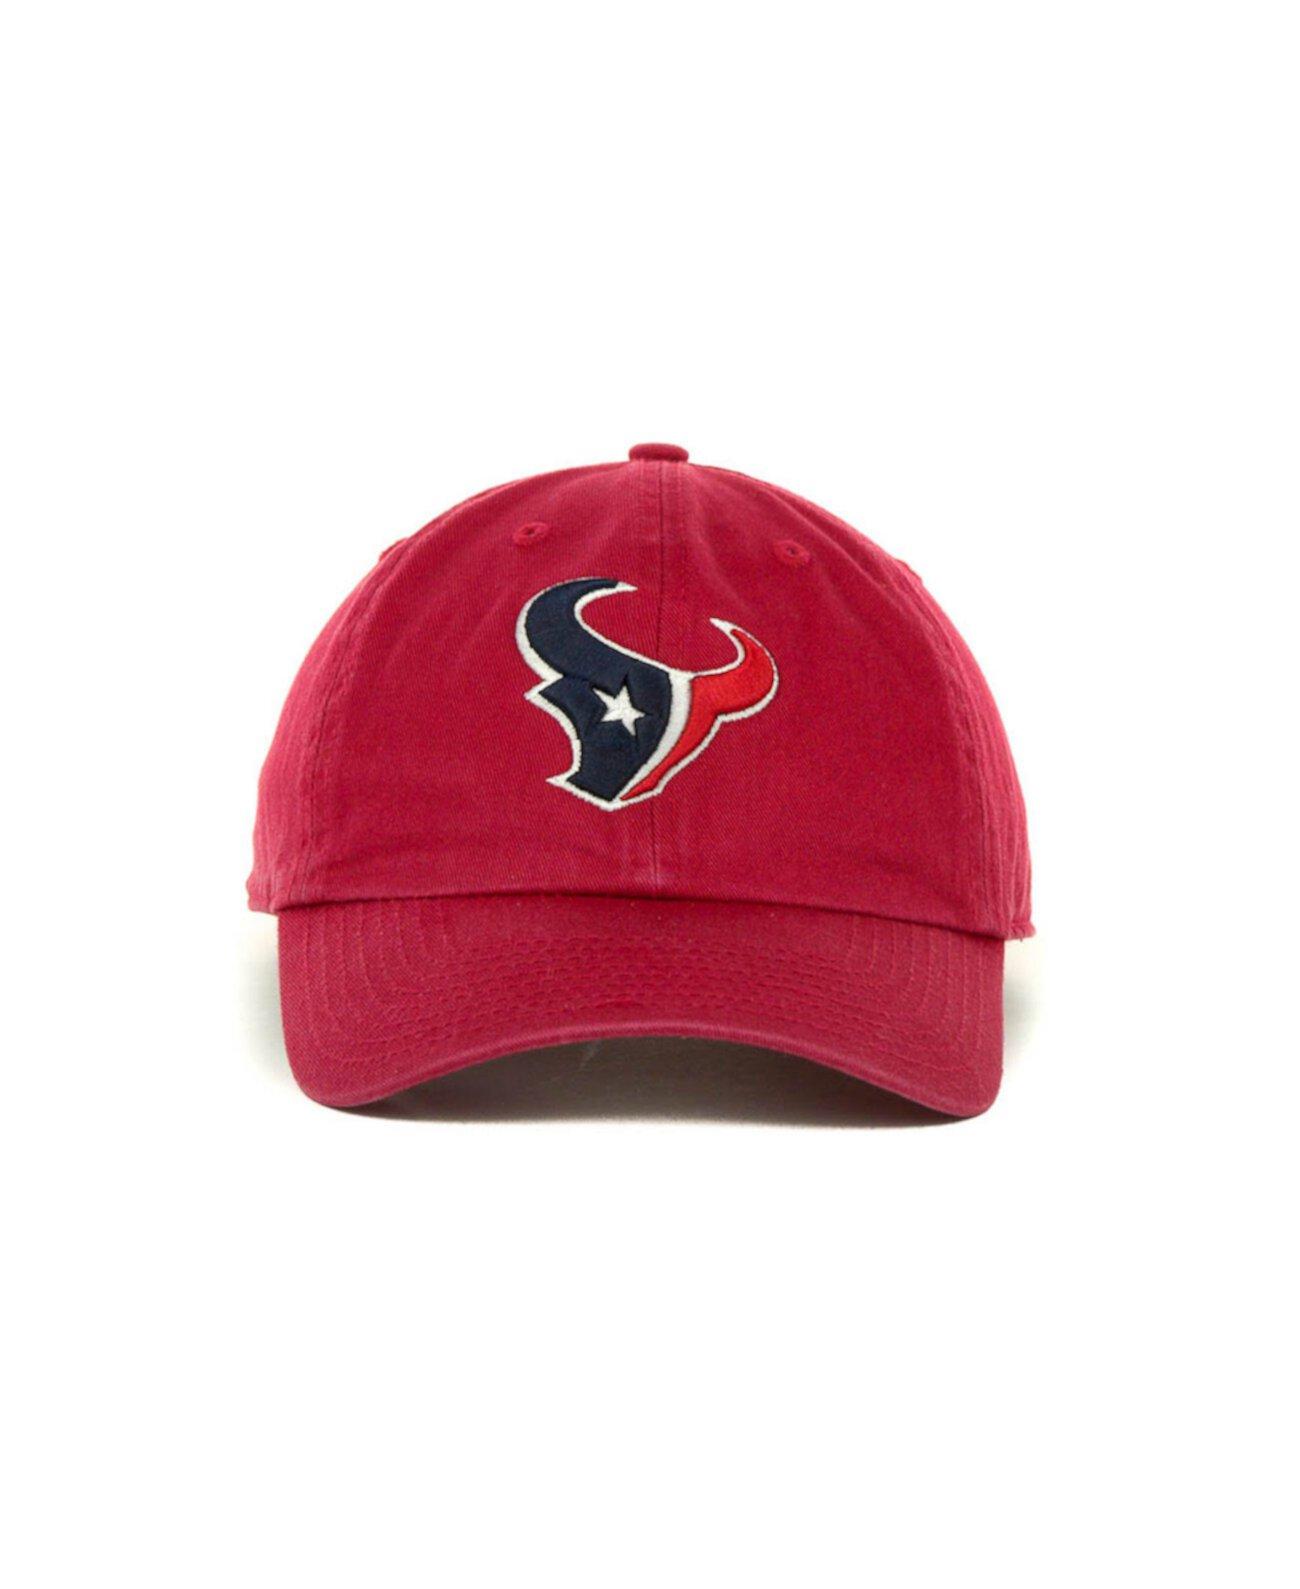 Хьюстонская техасская чистящая шапка '47 Brand